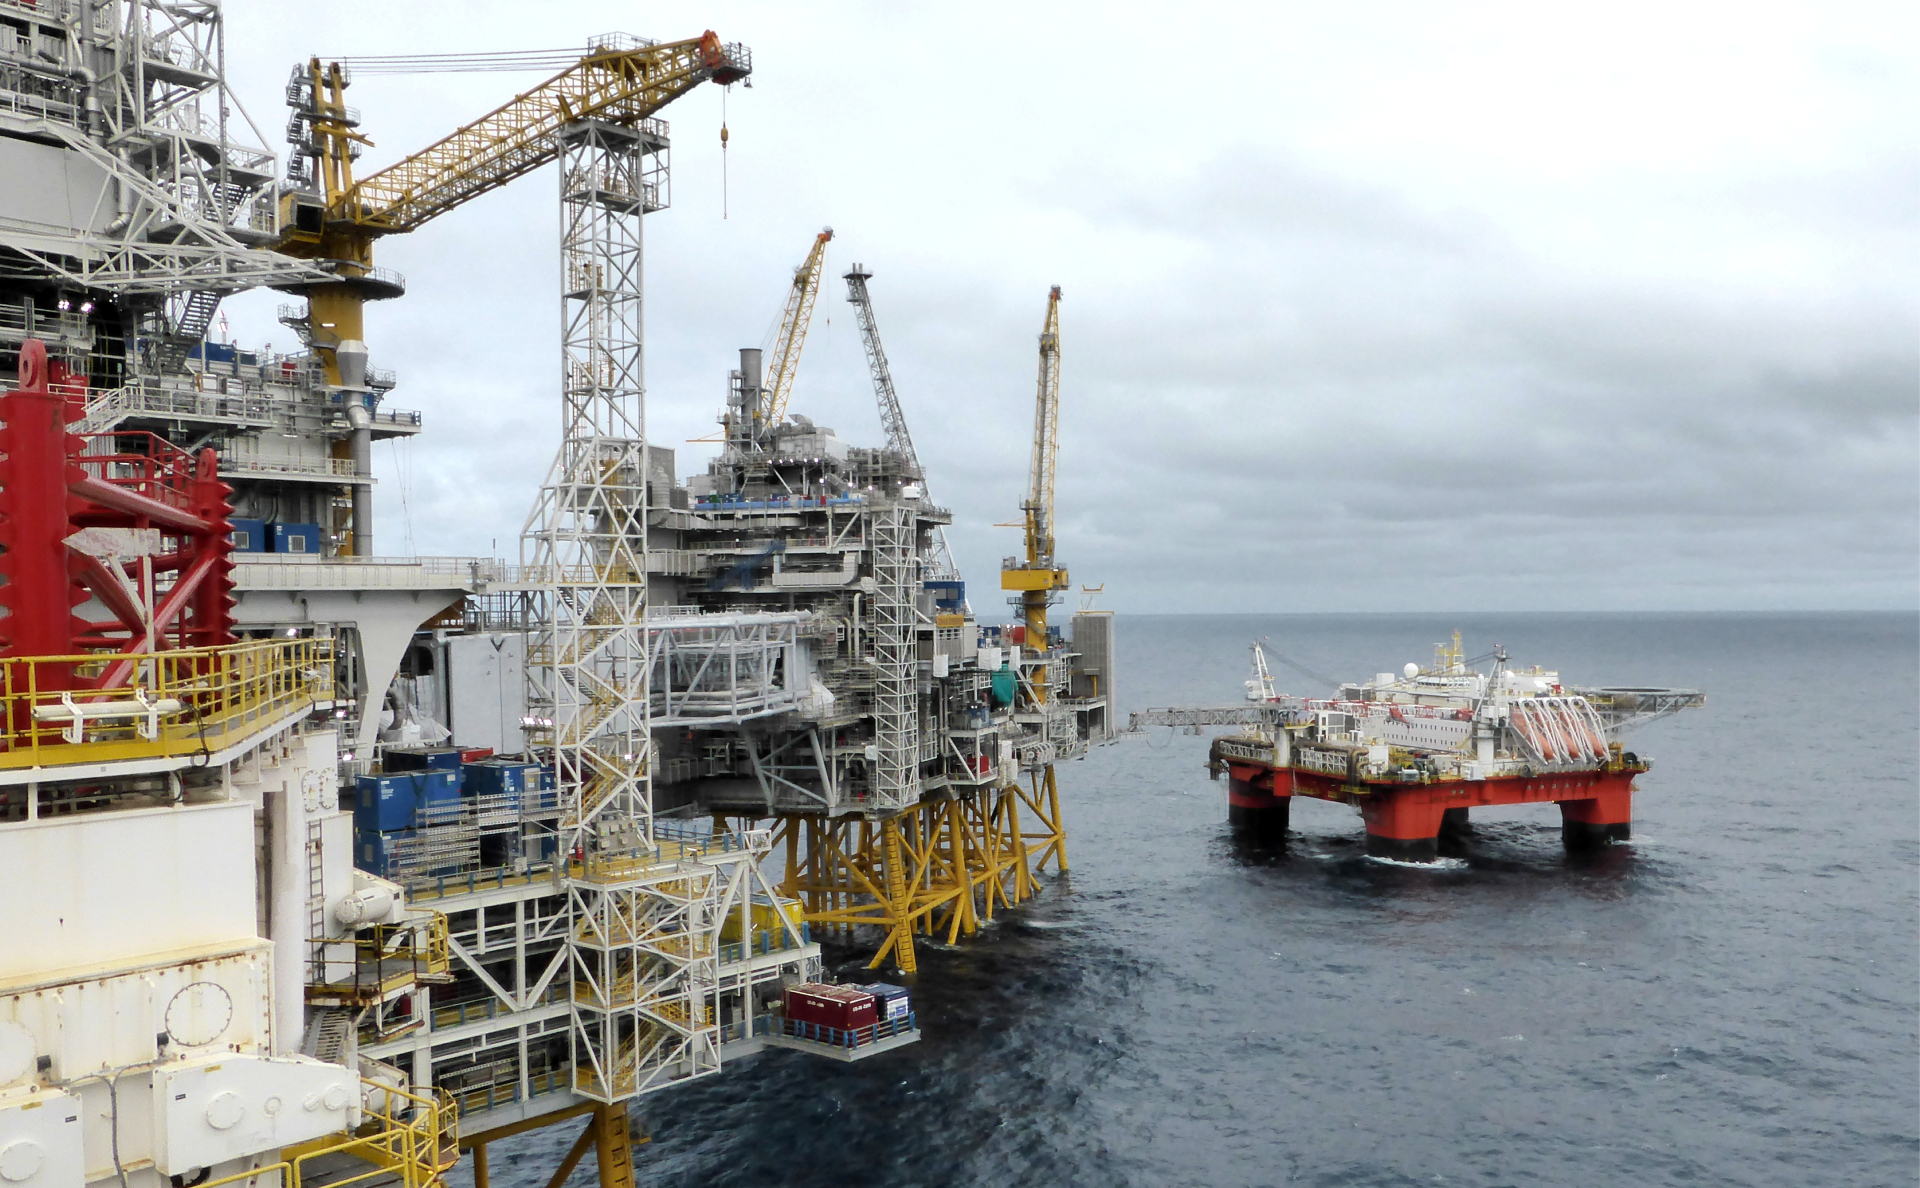 Добыча нефти у берегов Норвегии